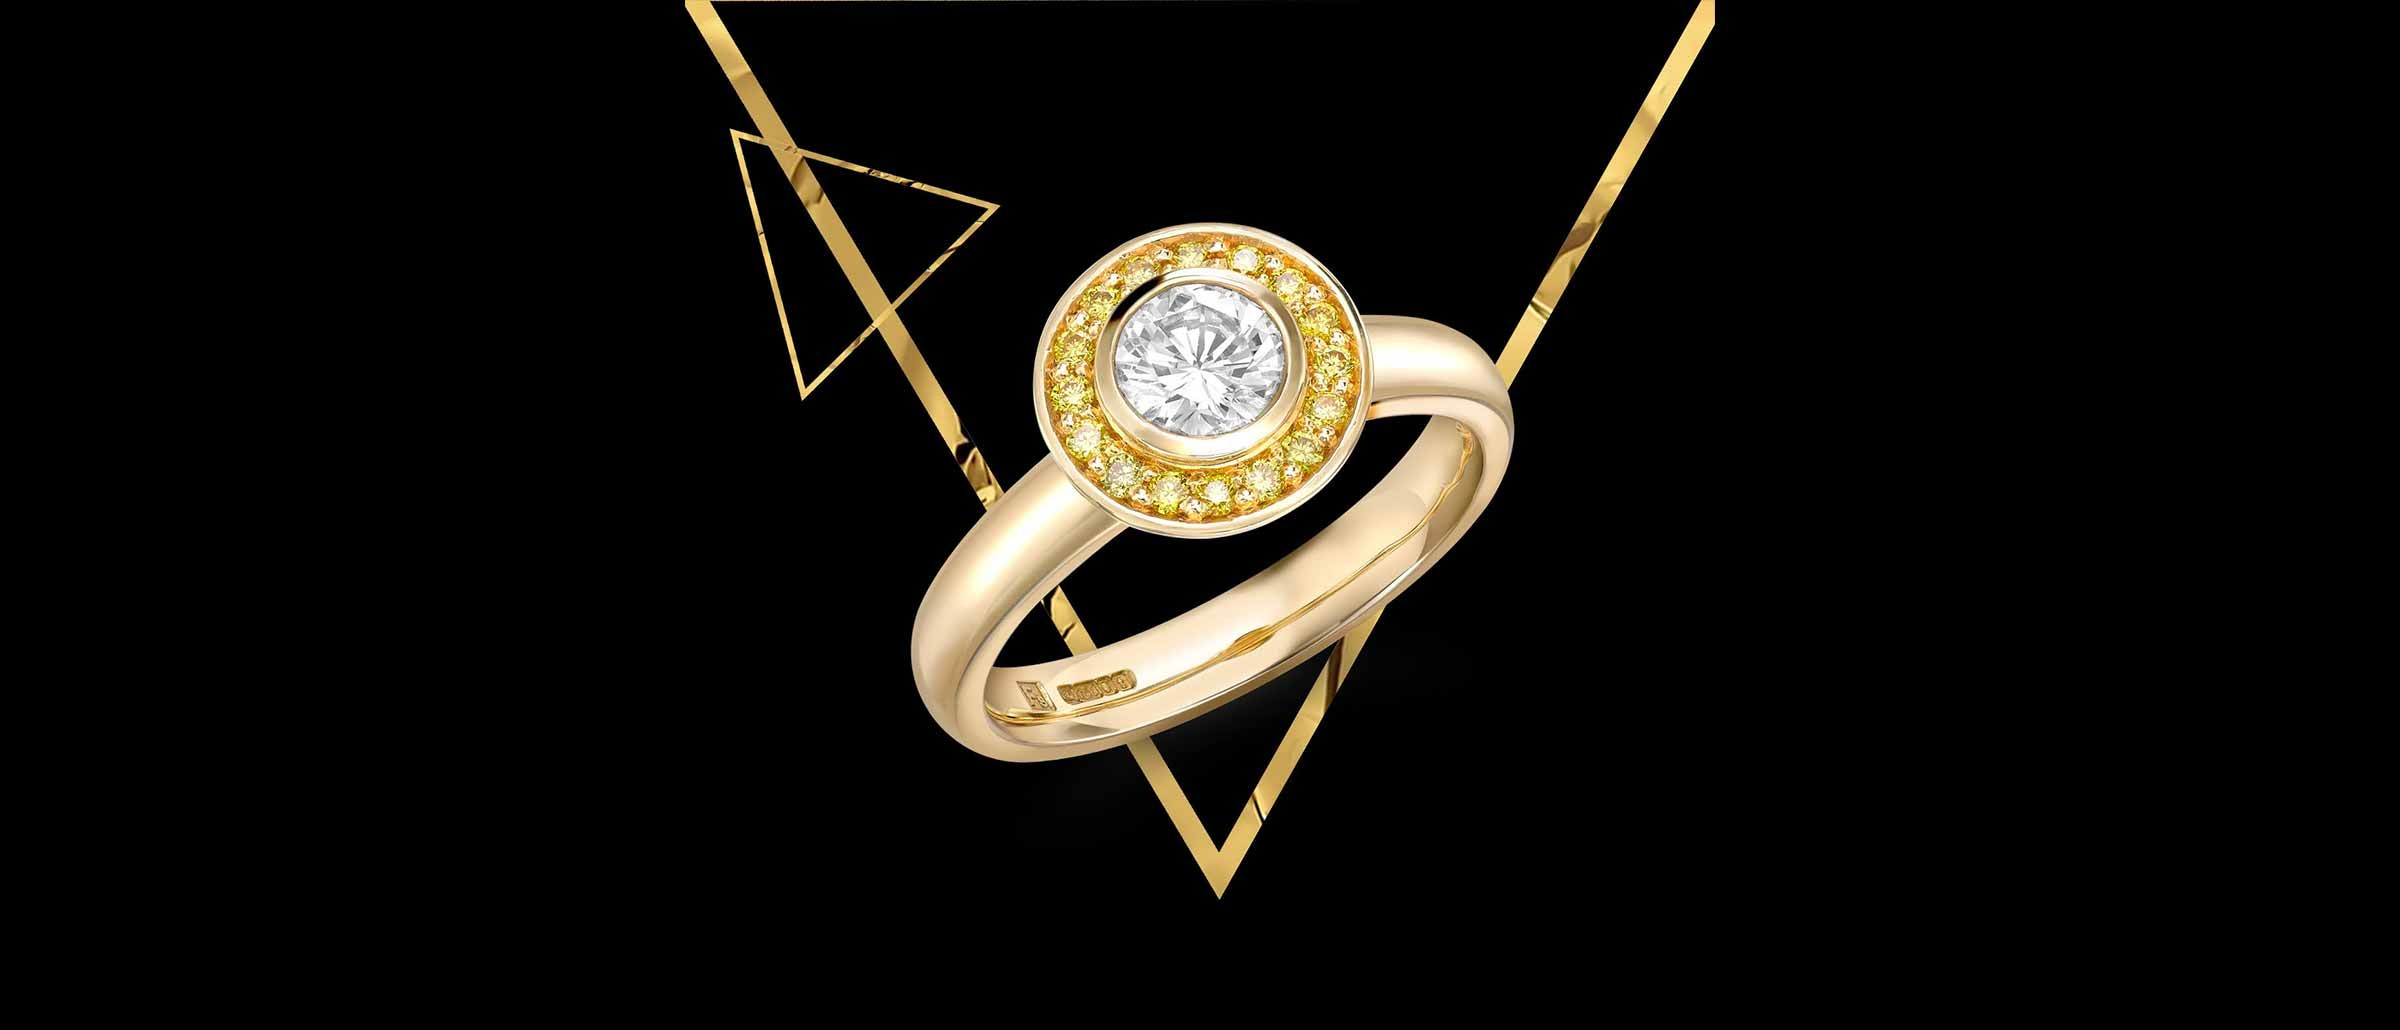 Timeless Gold Jewellery from Robert Bicknell Fine Jewellery